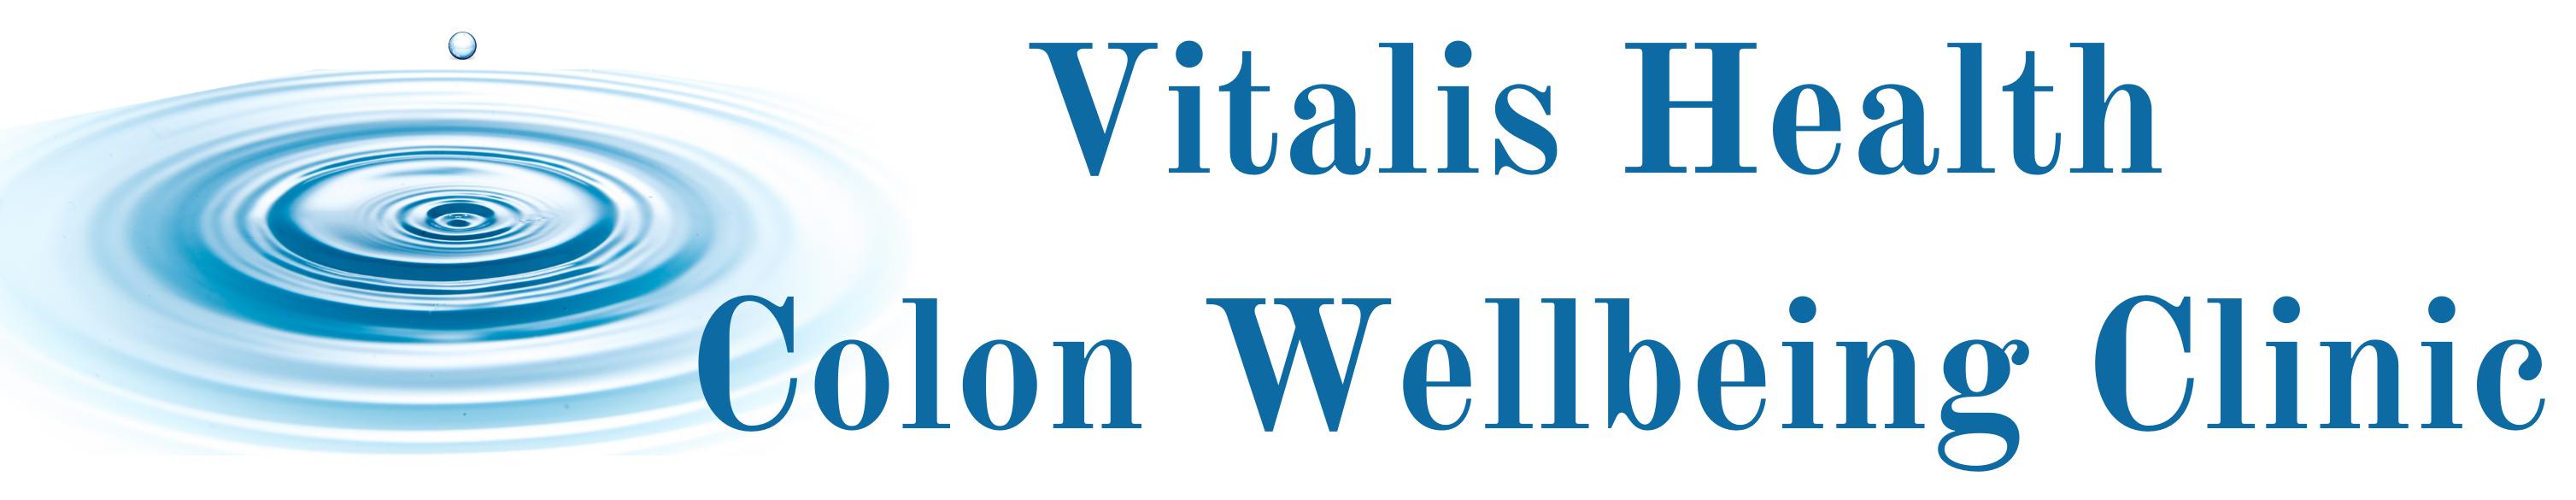 Vitalis Health Colon Wellbeing Clinic